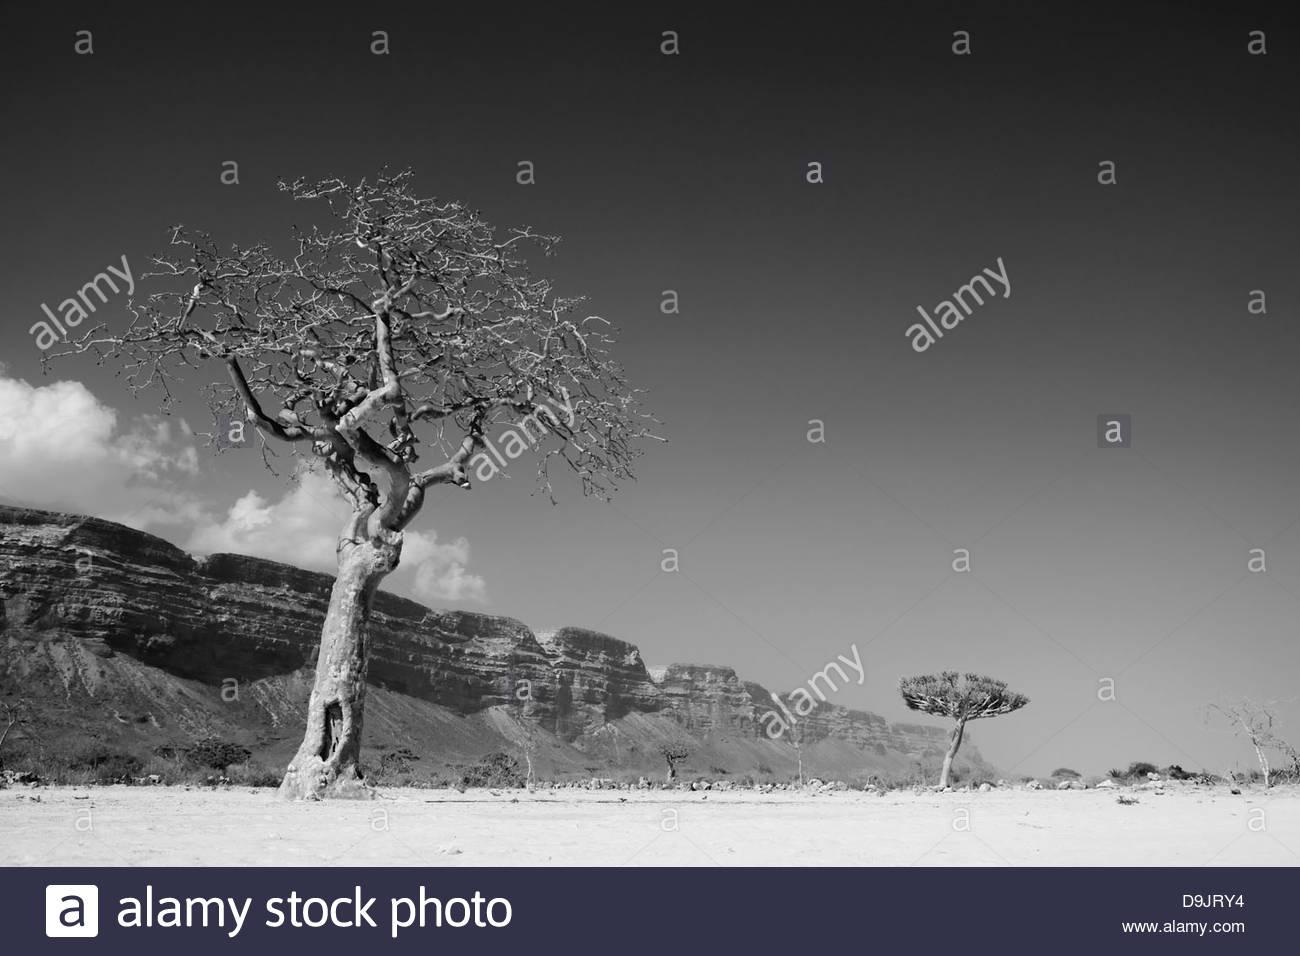 Trees in the barren landscape at Qa'arah, Socotra, Yemen - Stock Image